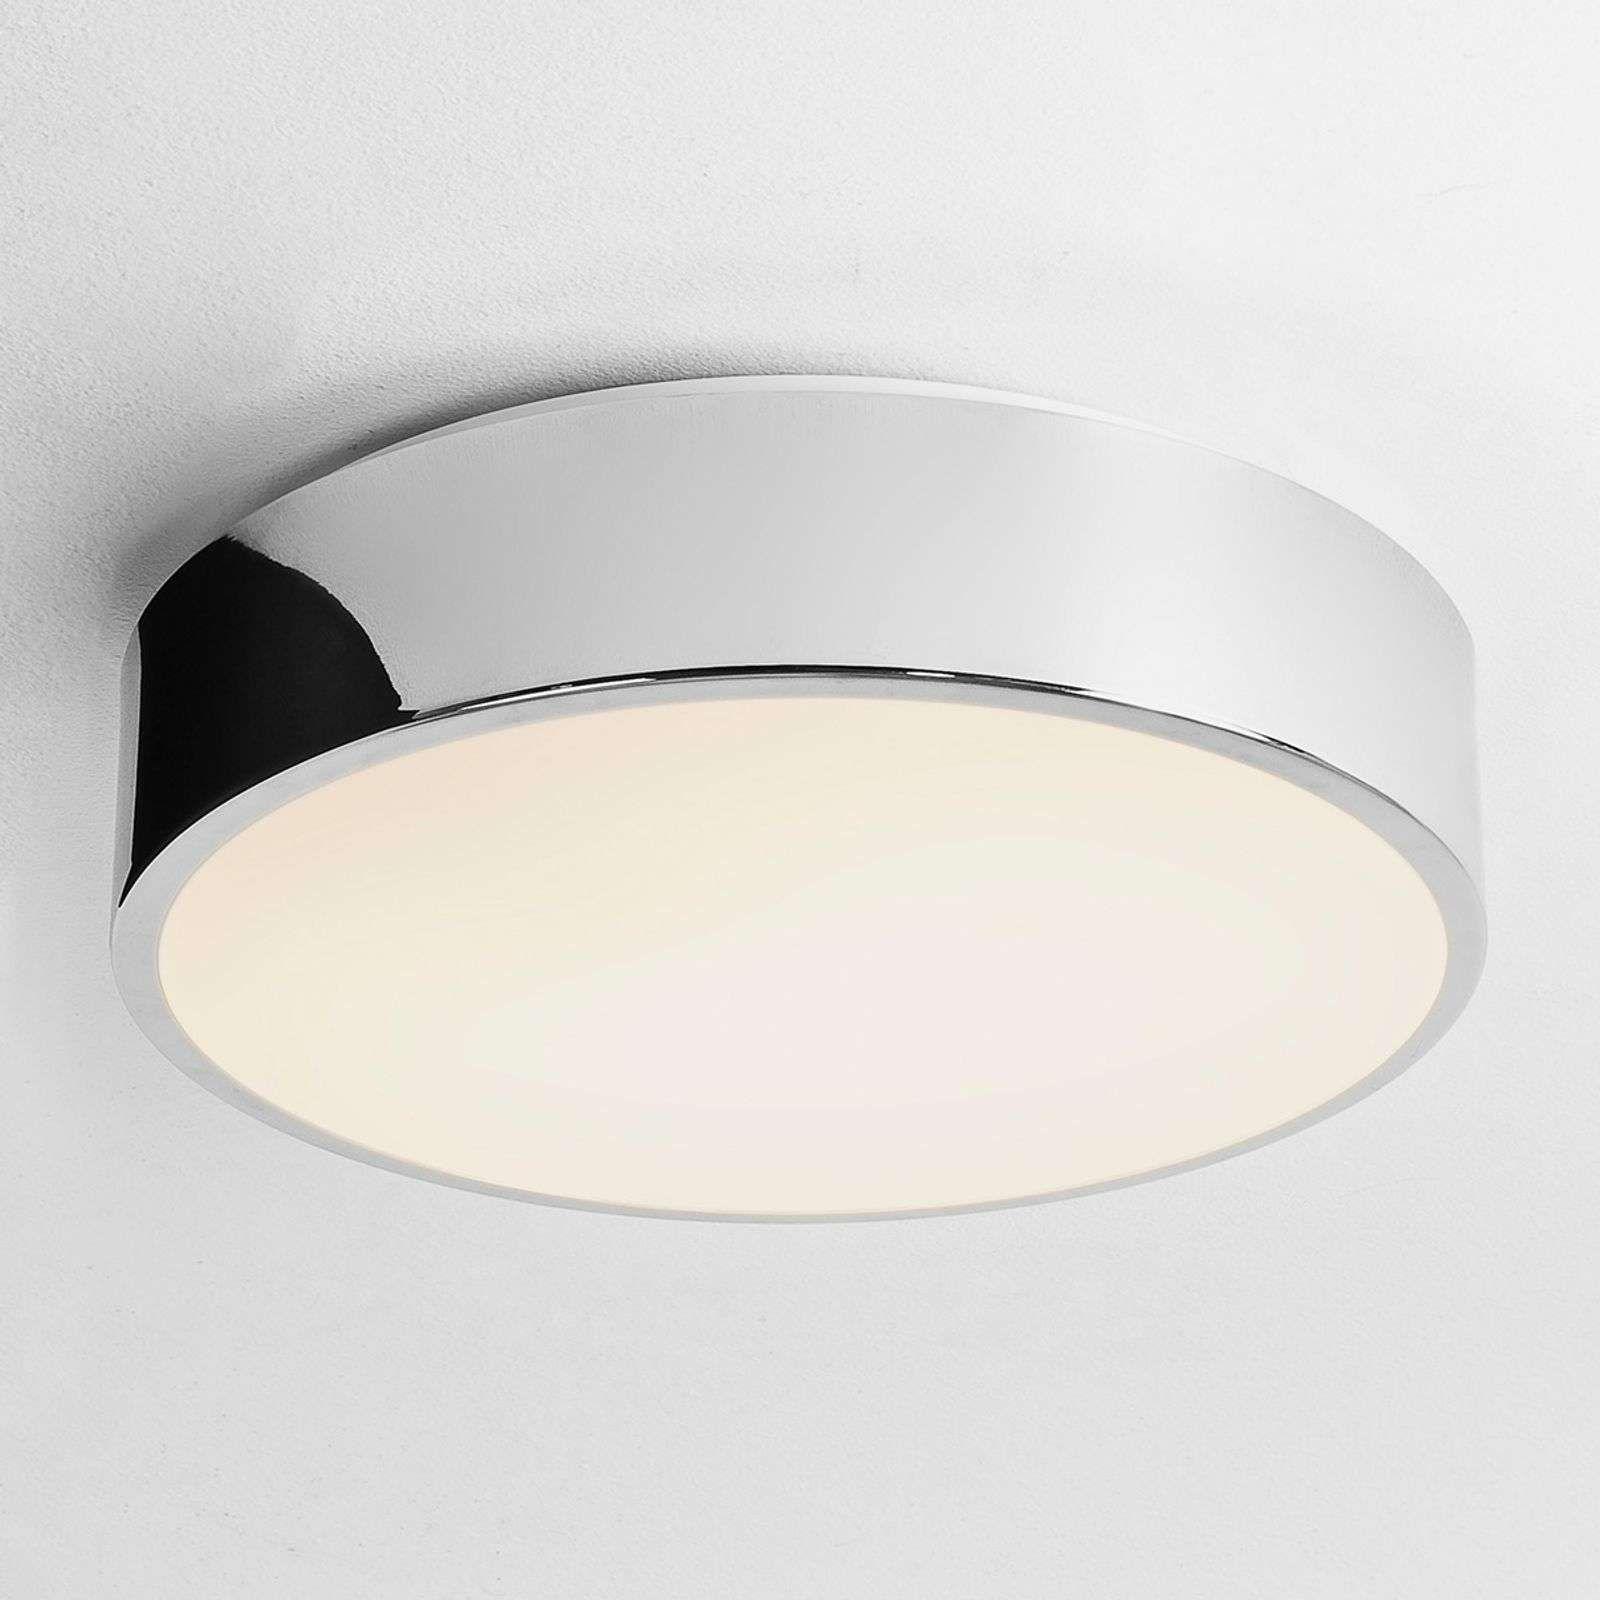 Indirekte Deckenbeleuchtung Badezimmer Esszimmer Lampe Led Modern Led Deckenleuchte Flach Quadratisch Deckenbeleuchtung Led Deckenleuchte Flach Led Lampe